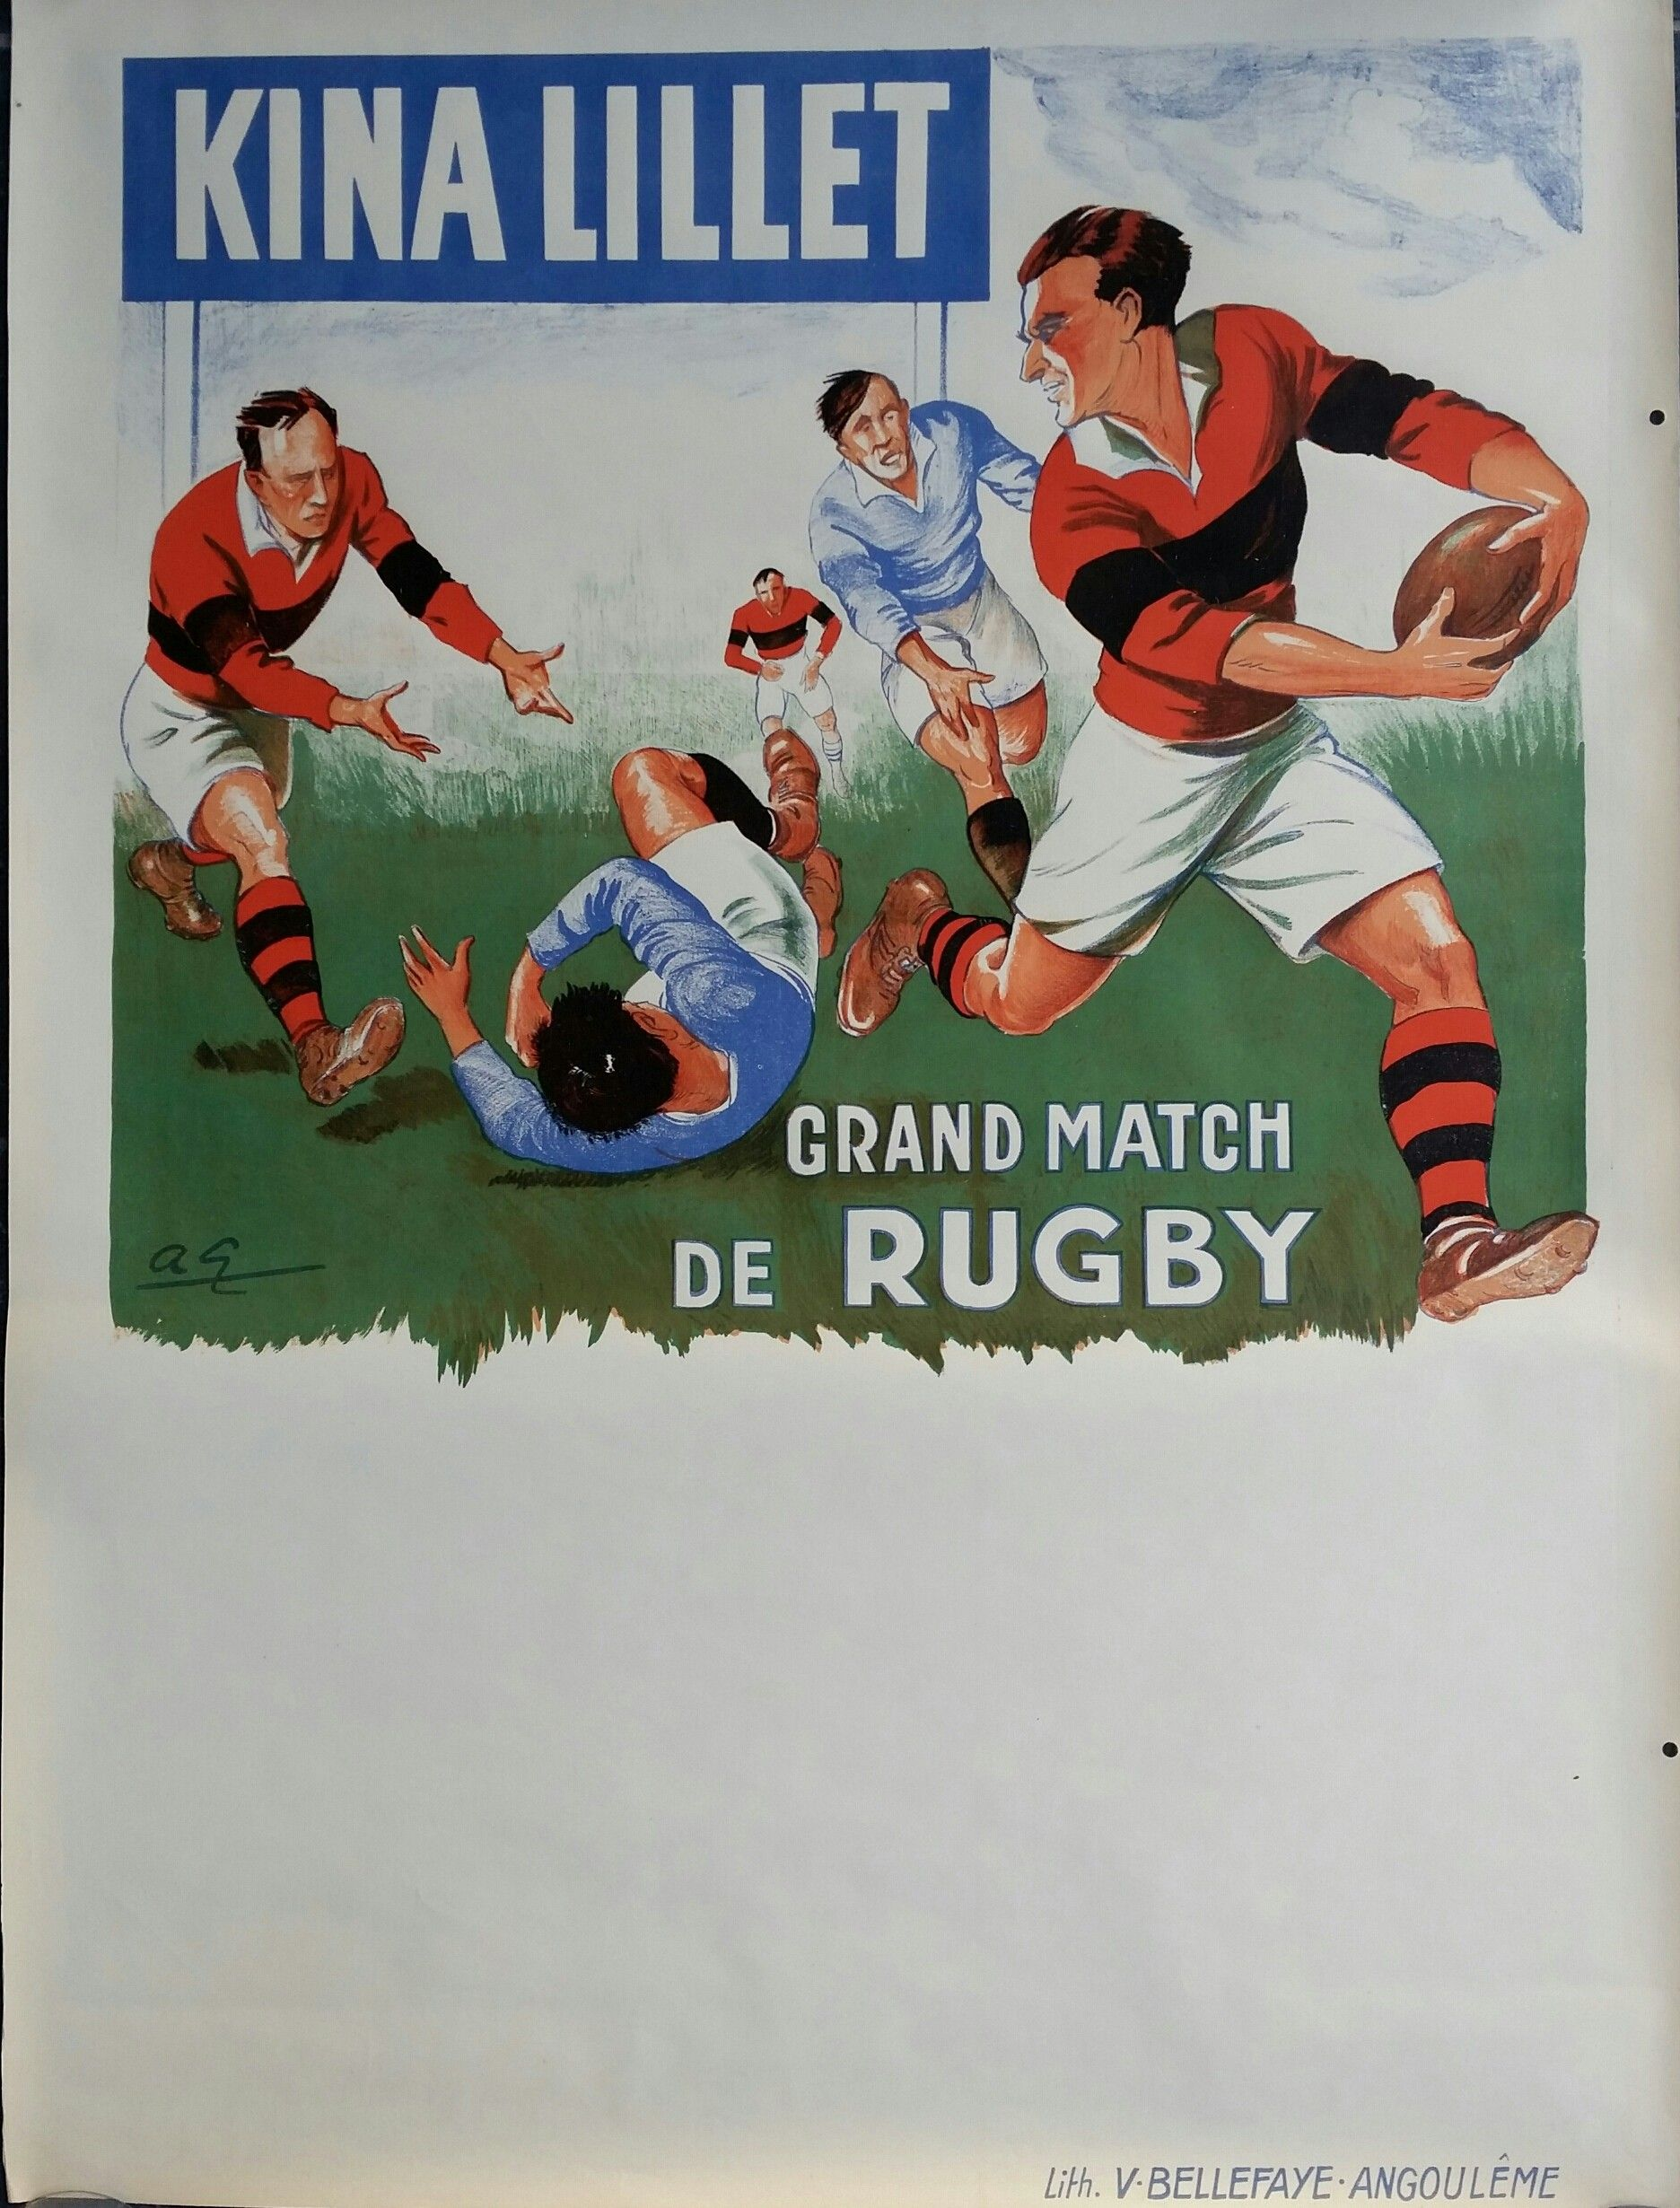 Original Vintage Poster Kina Lillet Grand Match De Rugby Bleu Andre Galland Rugby Poster Rugby Rugby Images